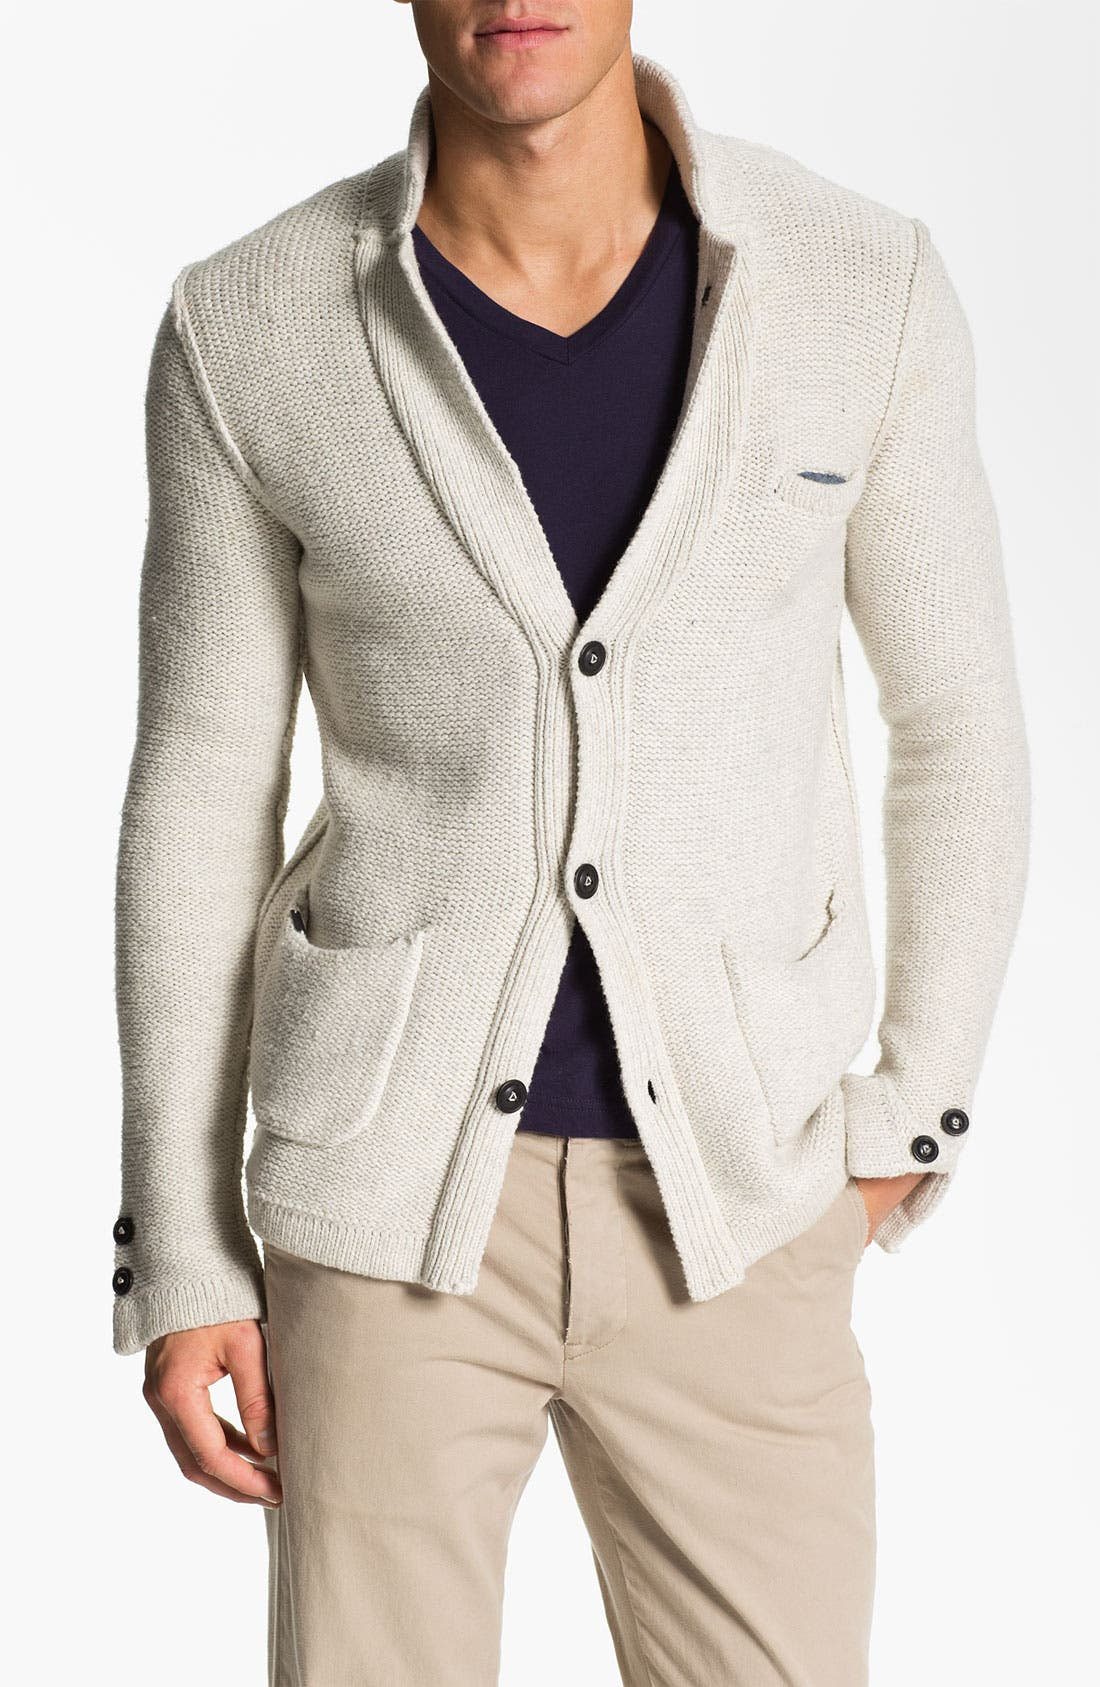 Alternate Image 1 Selected - J.C. Rags Reverse Knit Three Button Sweater Blazer